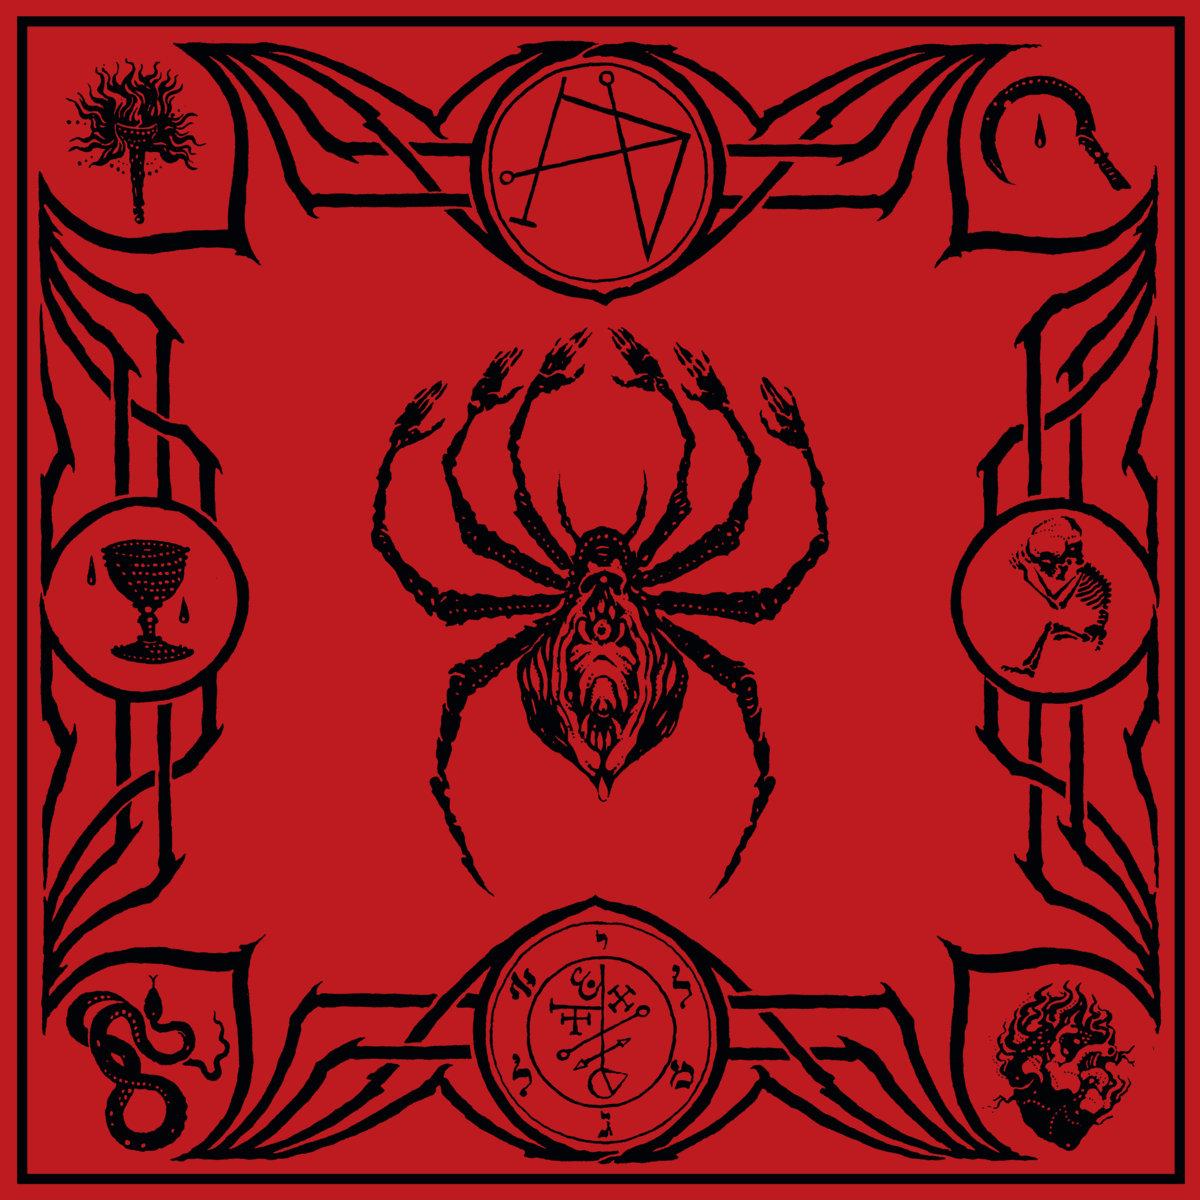 LVTHN - The Spider Goddess